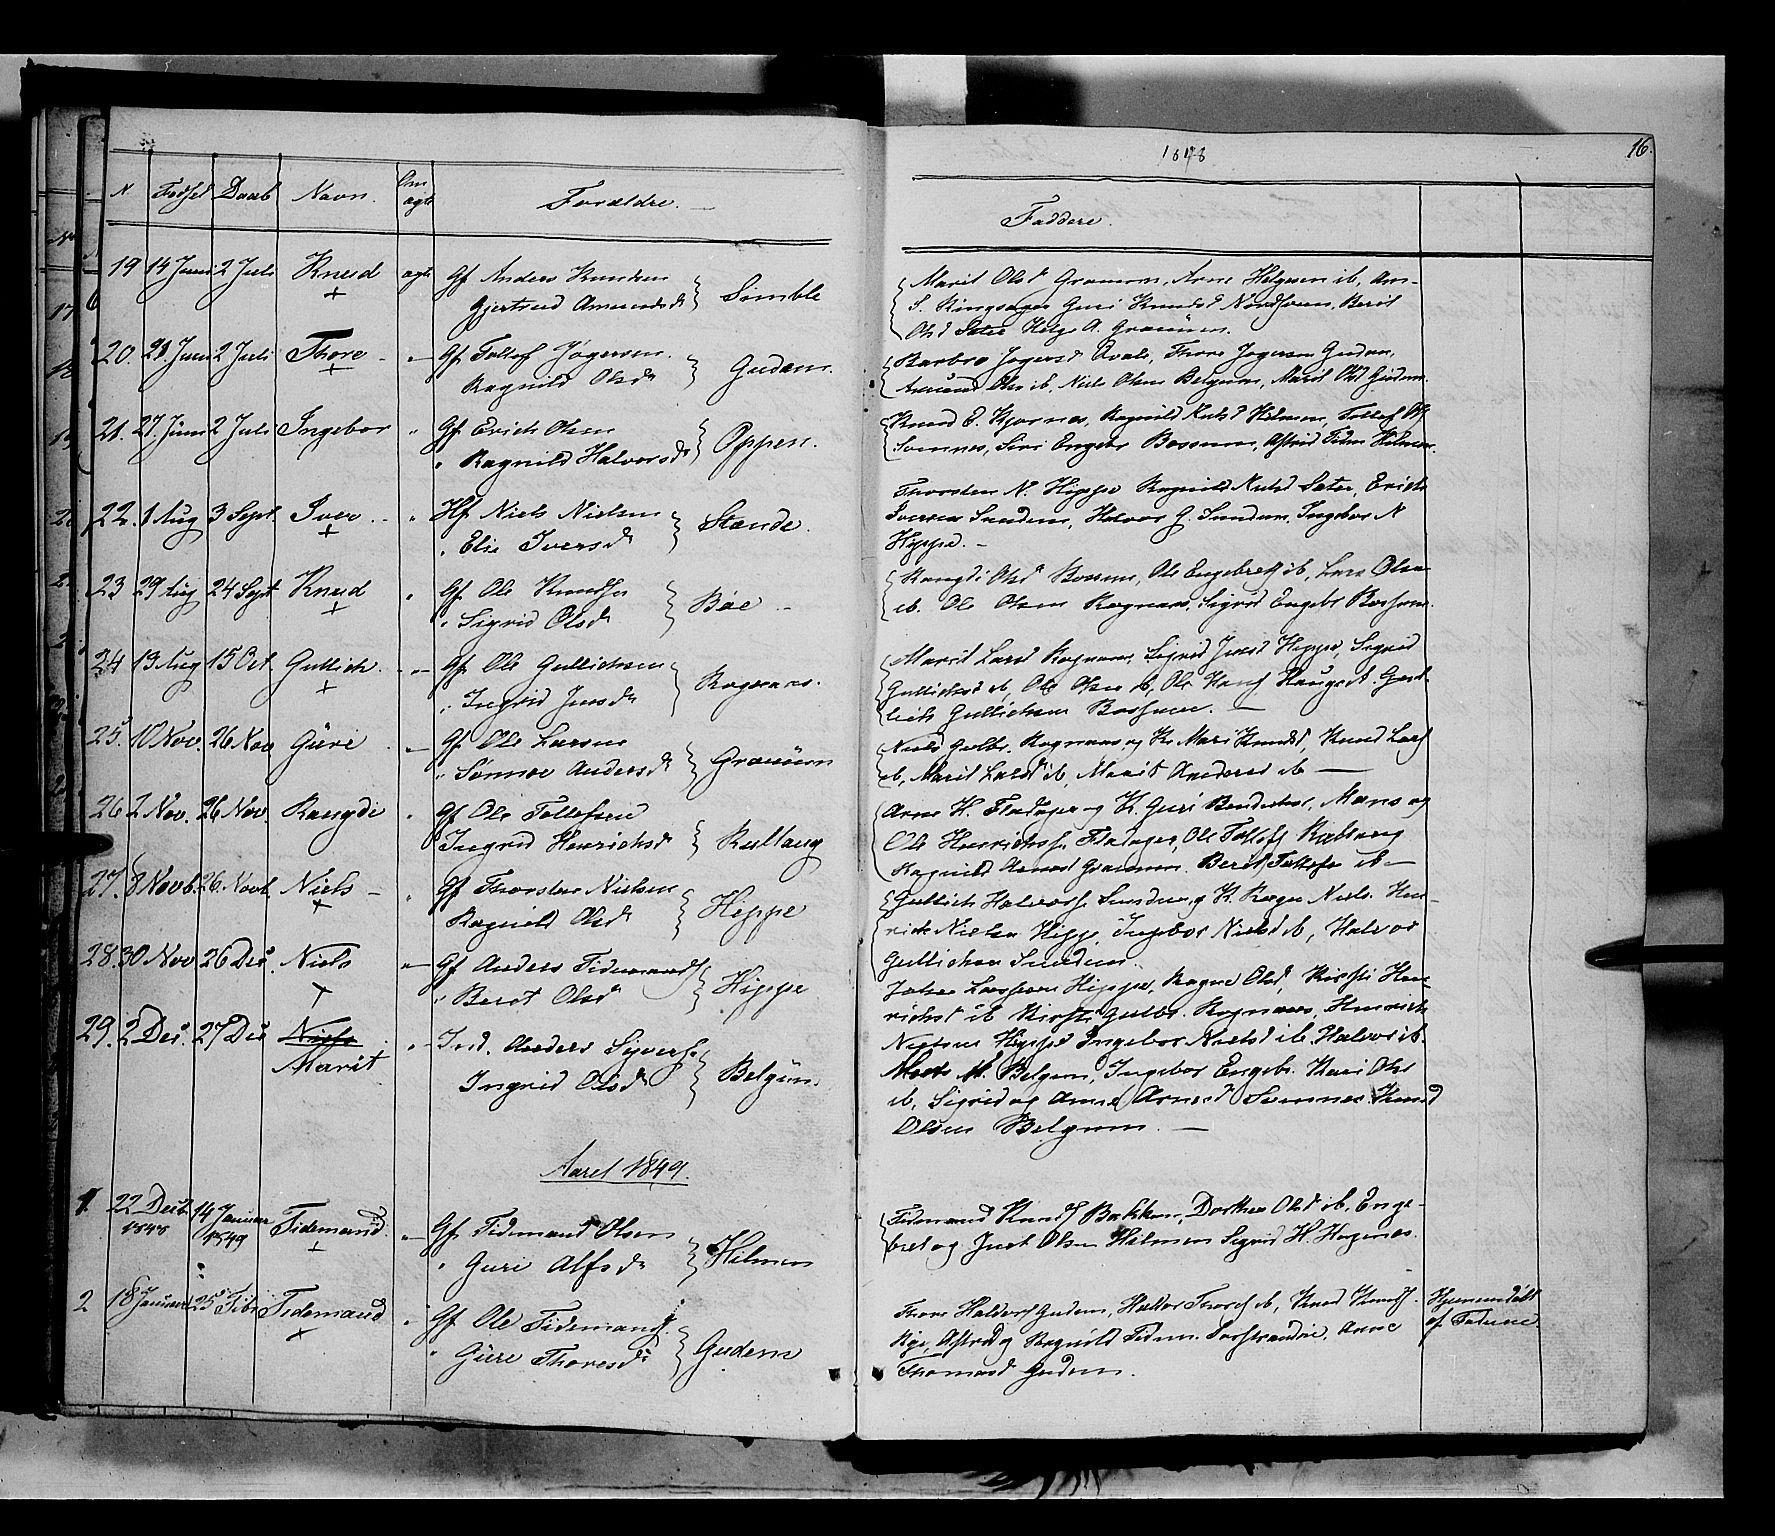 SAH, Nord-Aurdal prestekontor, Ministerialbok nr. 6, 1842-1863, s. 16